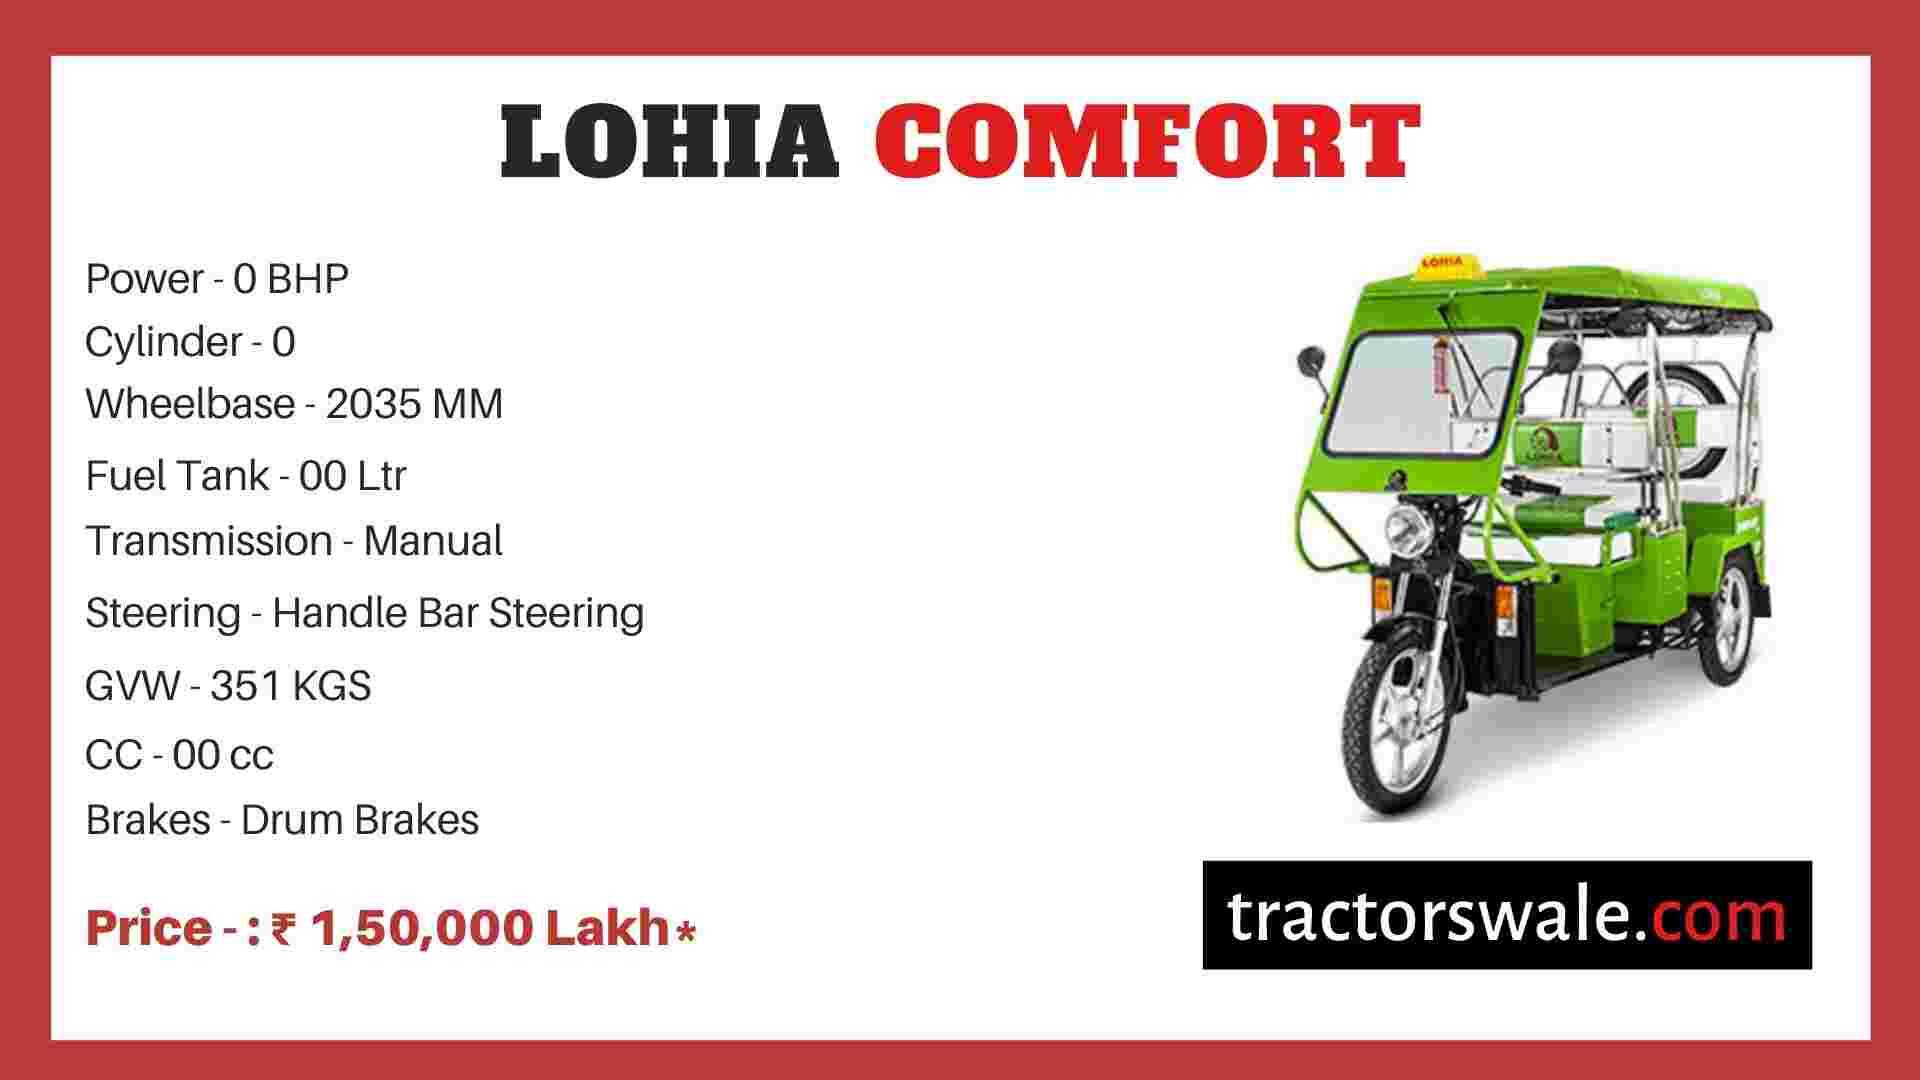 Lohia Comfort price